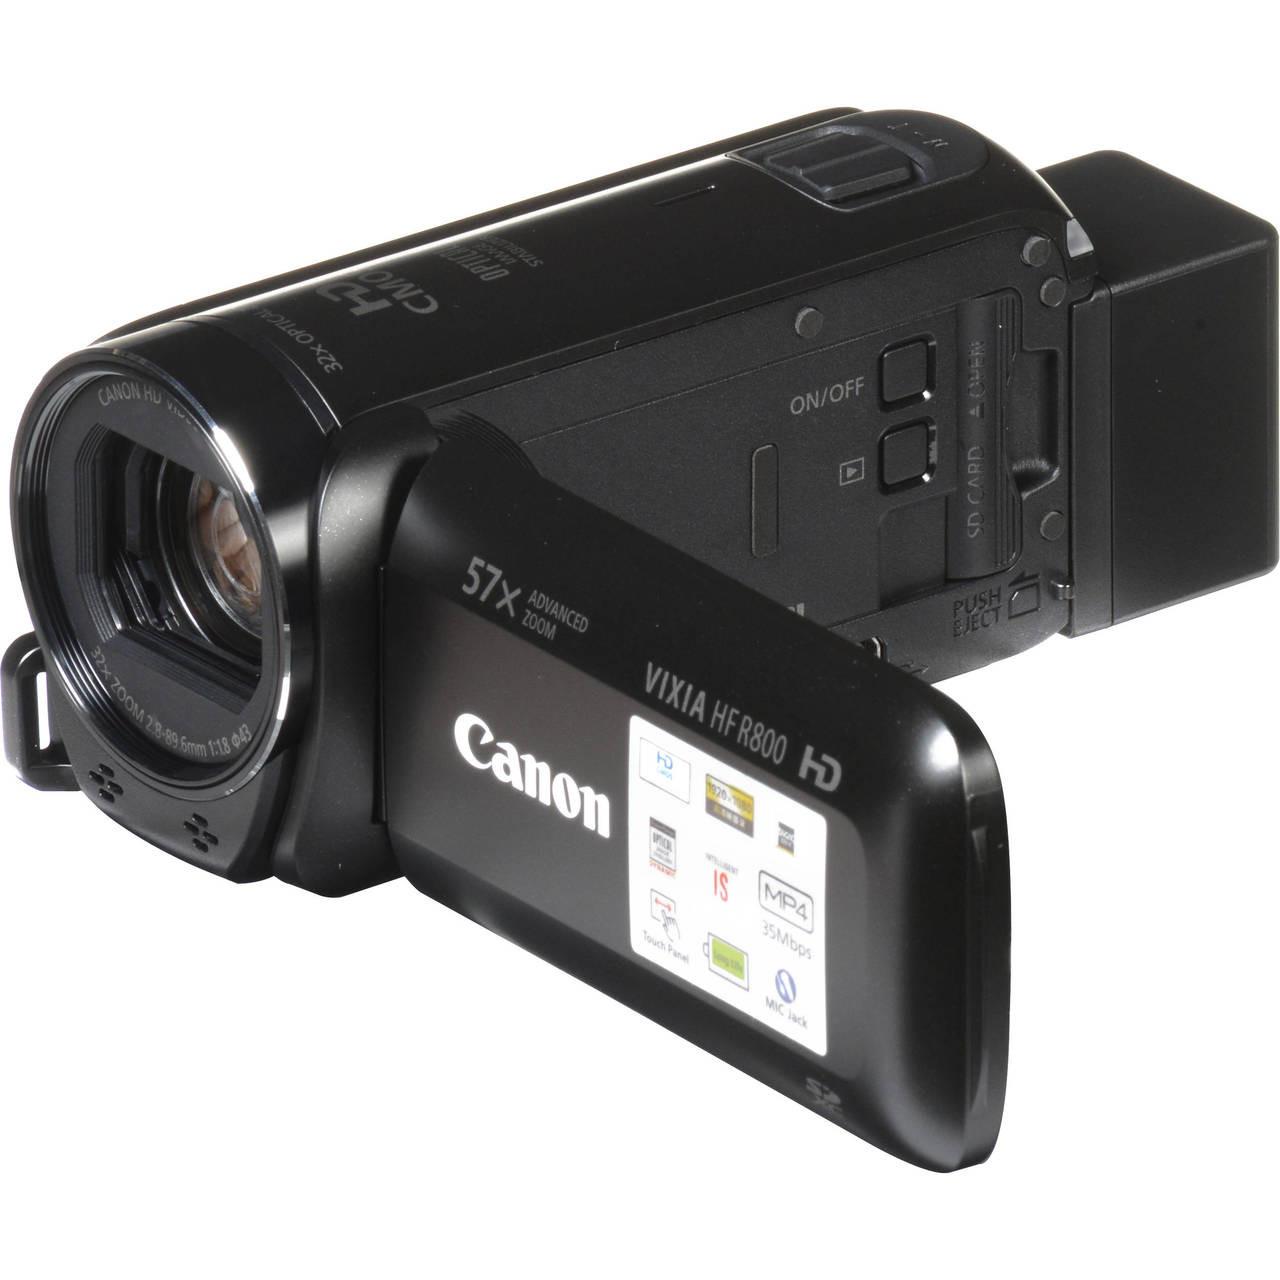 22d8944f9b3 Canon VIXIA HF R800 Camcorder (Black) - Ace Photo